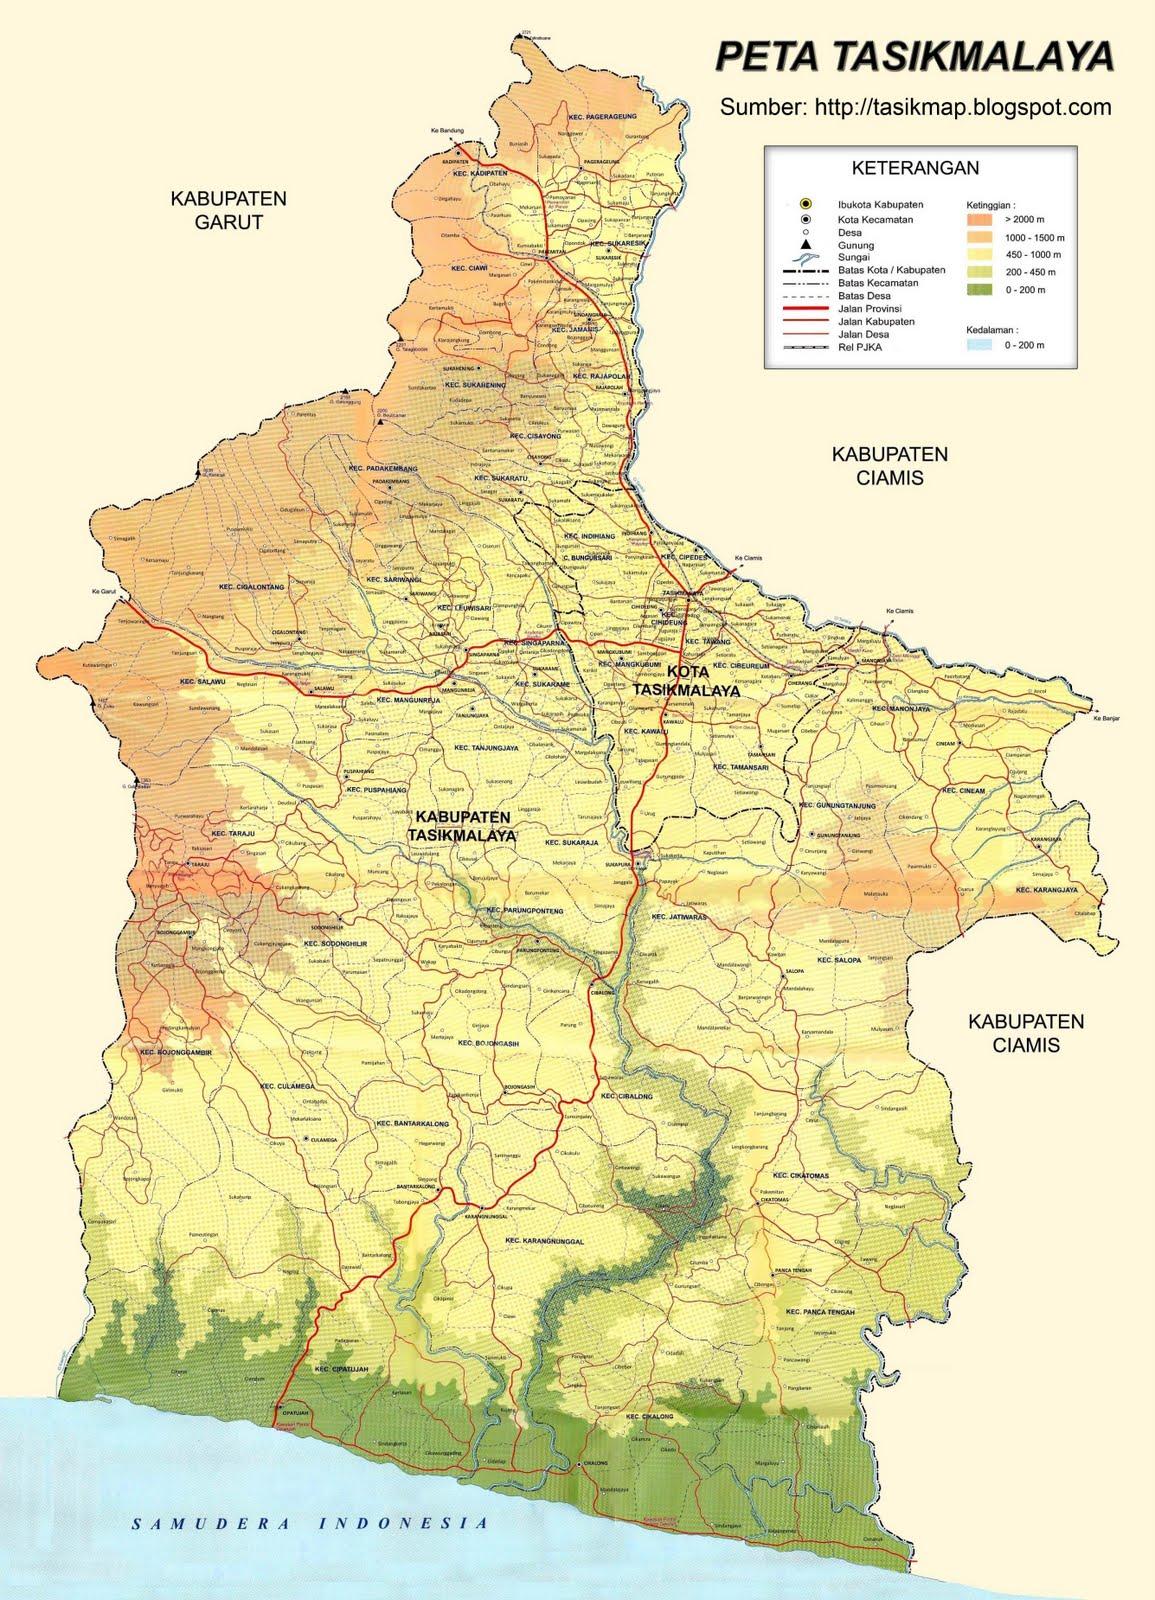 Peta Kota Peta Kabupaten Tasikmalaya